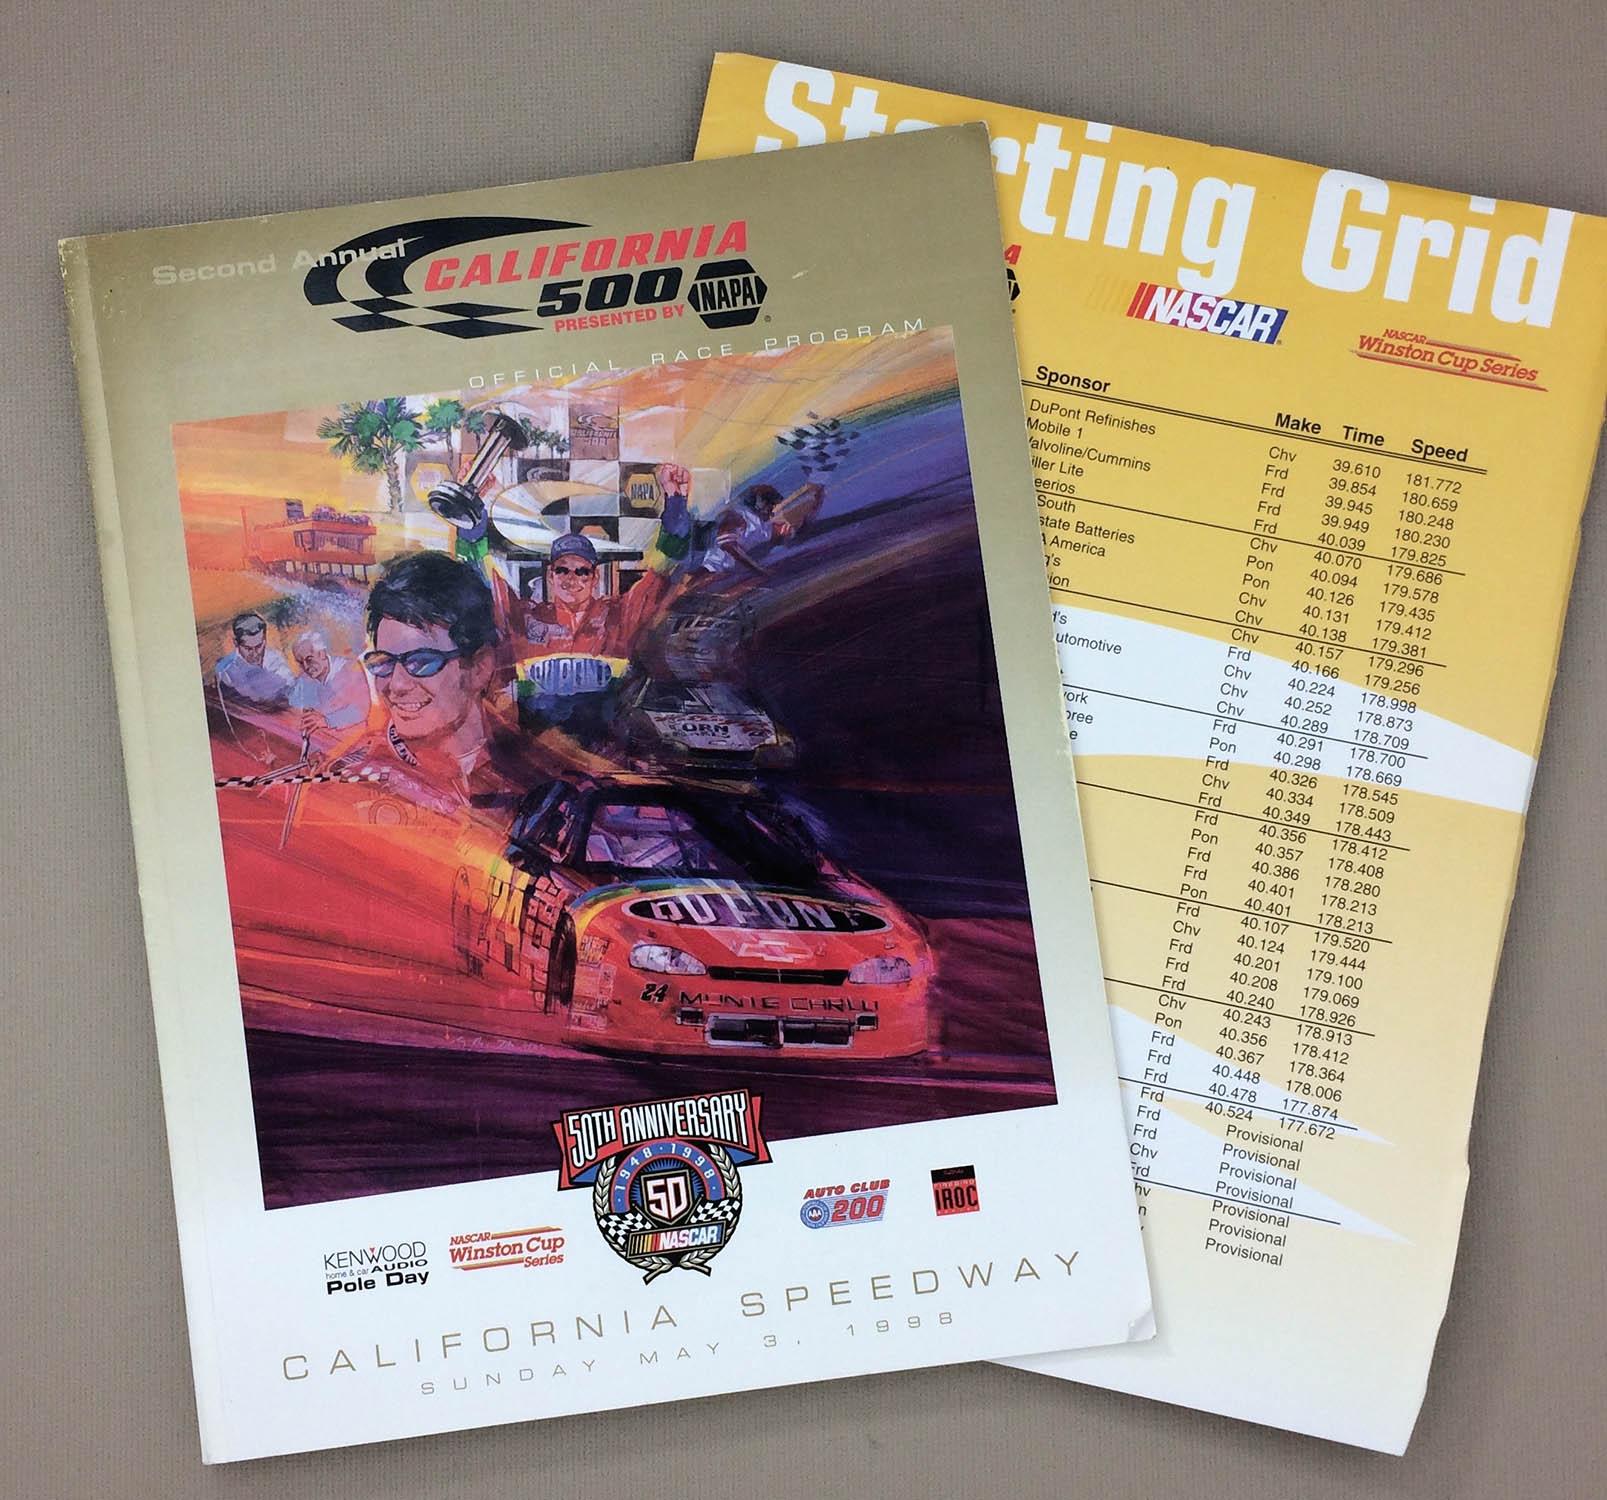 1998 California 500 Program